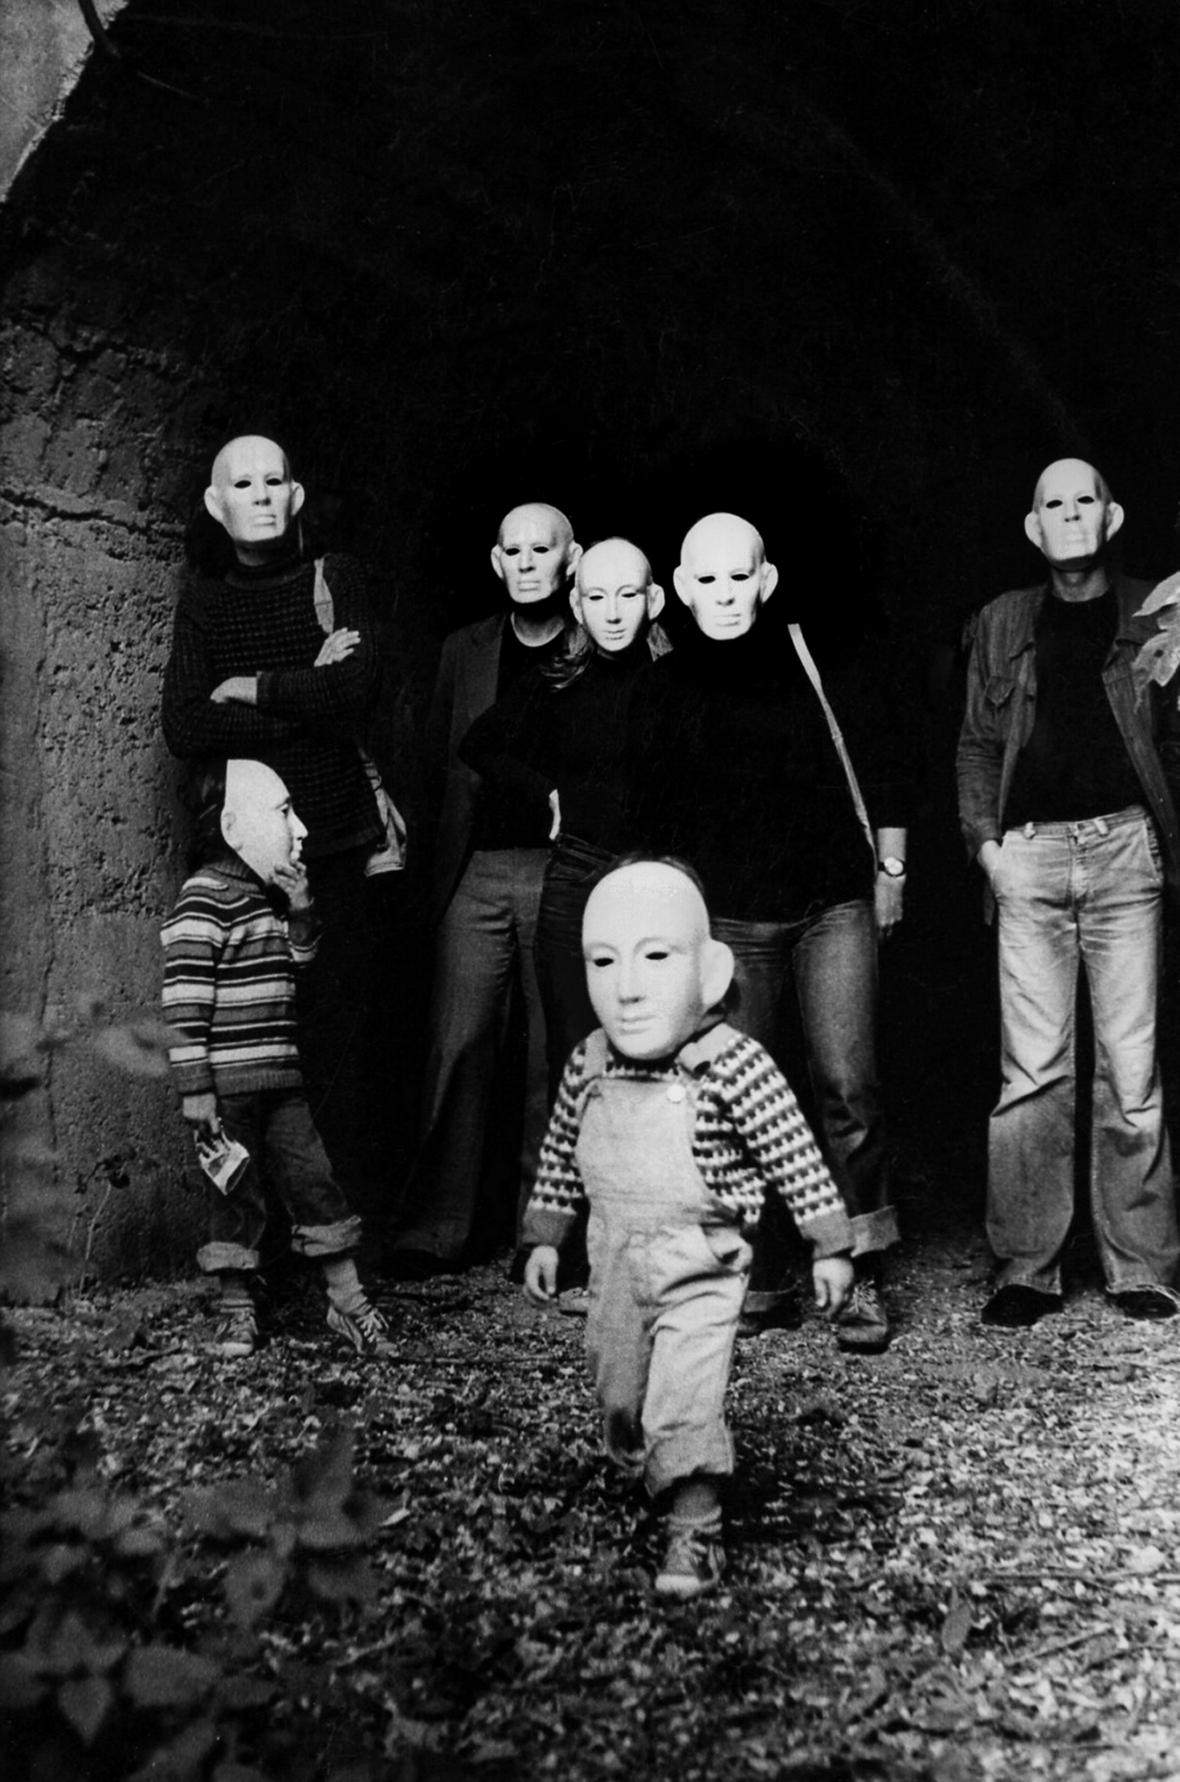 Vladimír Ambroz / Anonymity – Plastic People, 1976